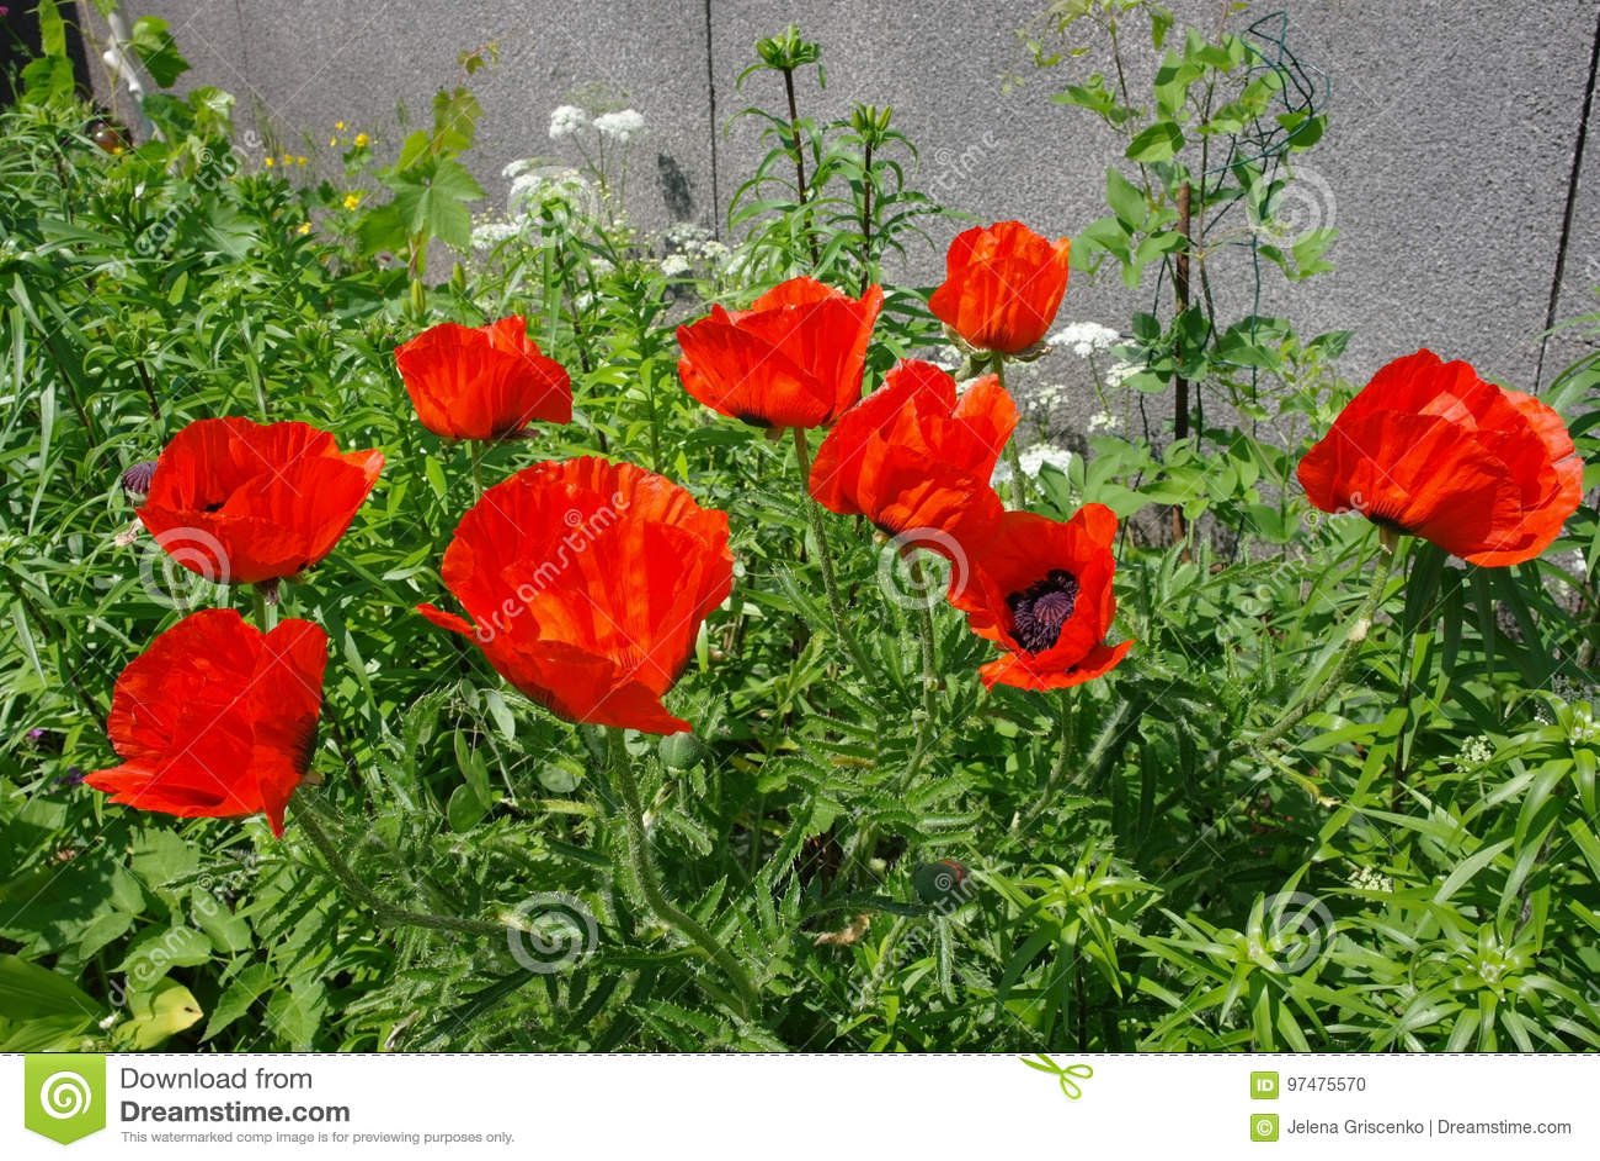 Fiori rossi dei papaveri nel giardino